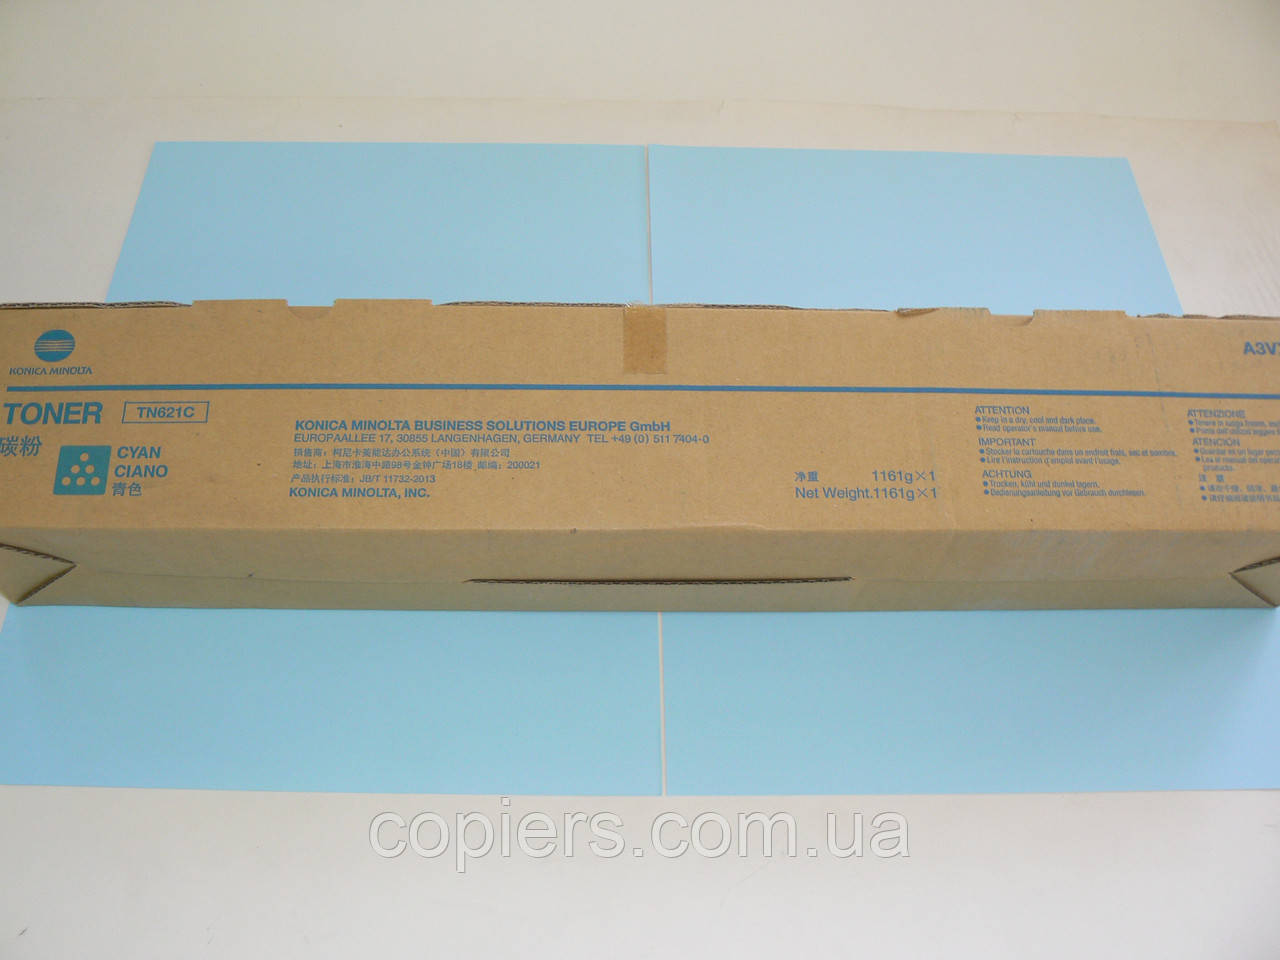 Тонер TN621 C Konica Minolta Bizhub Press C71hc, оригинал